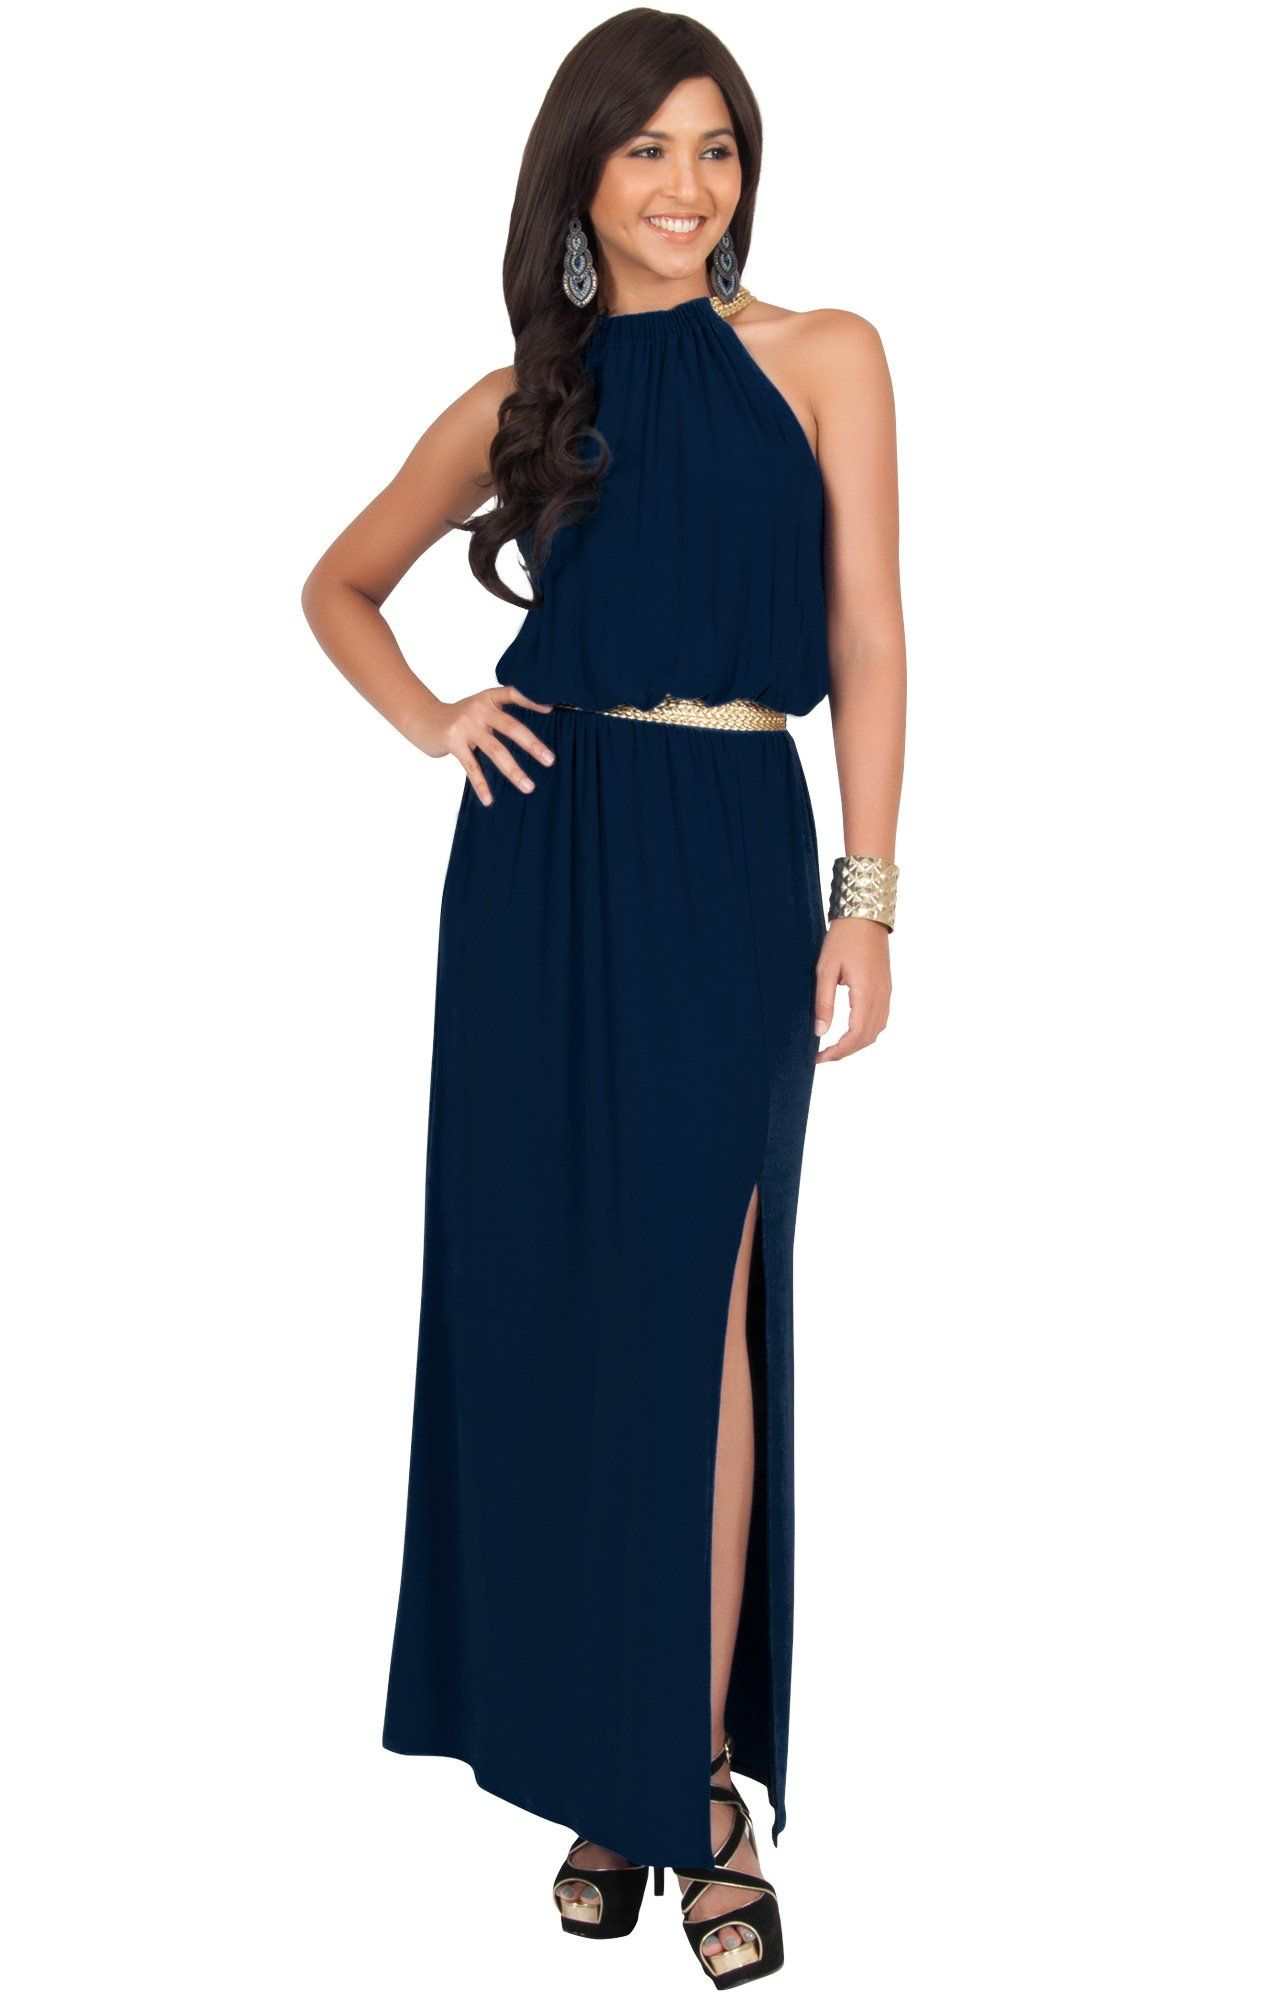 Halter Sun Dress with Belt